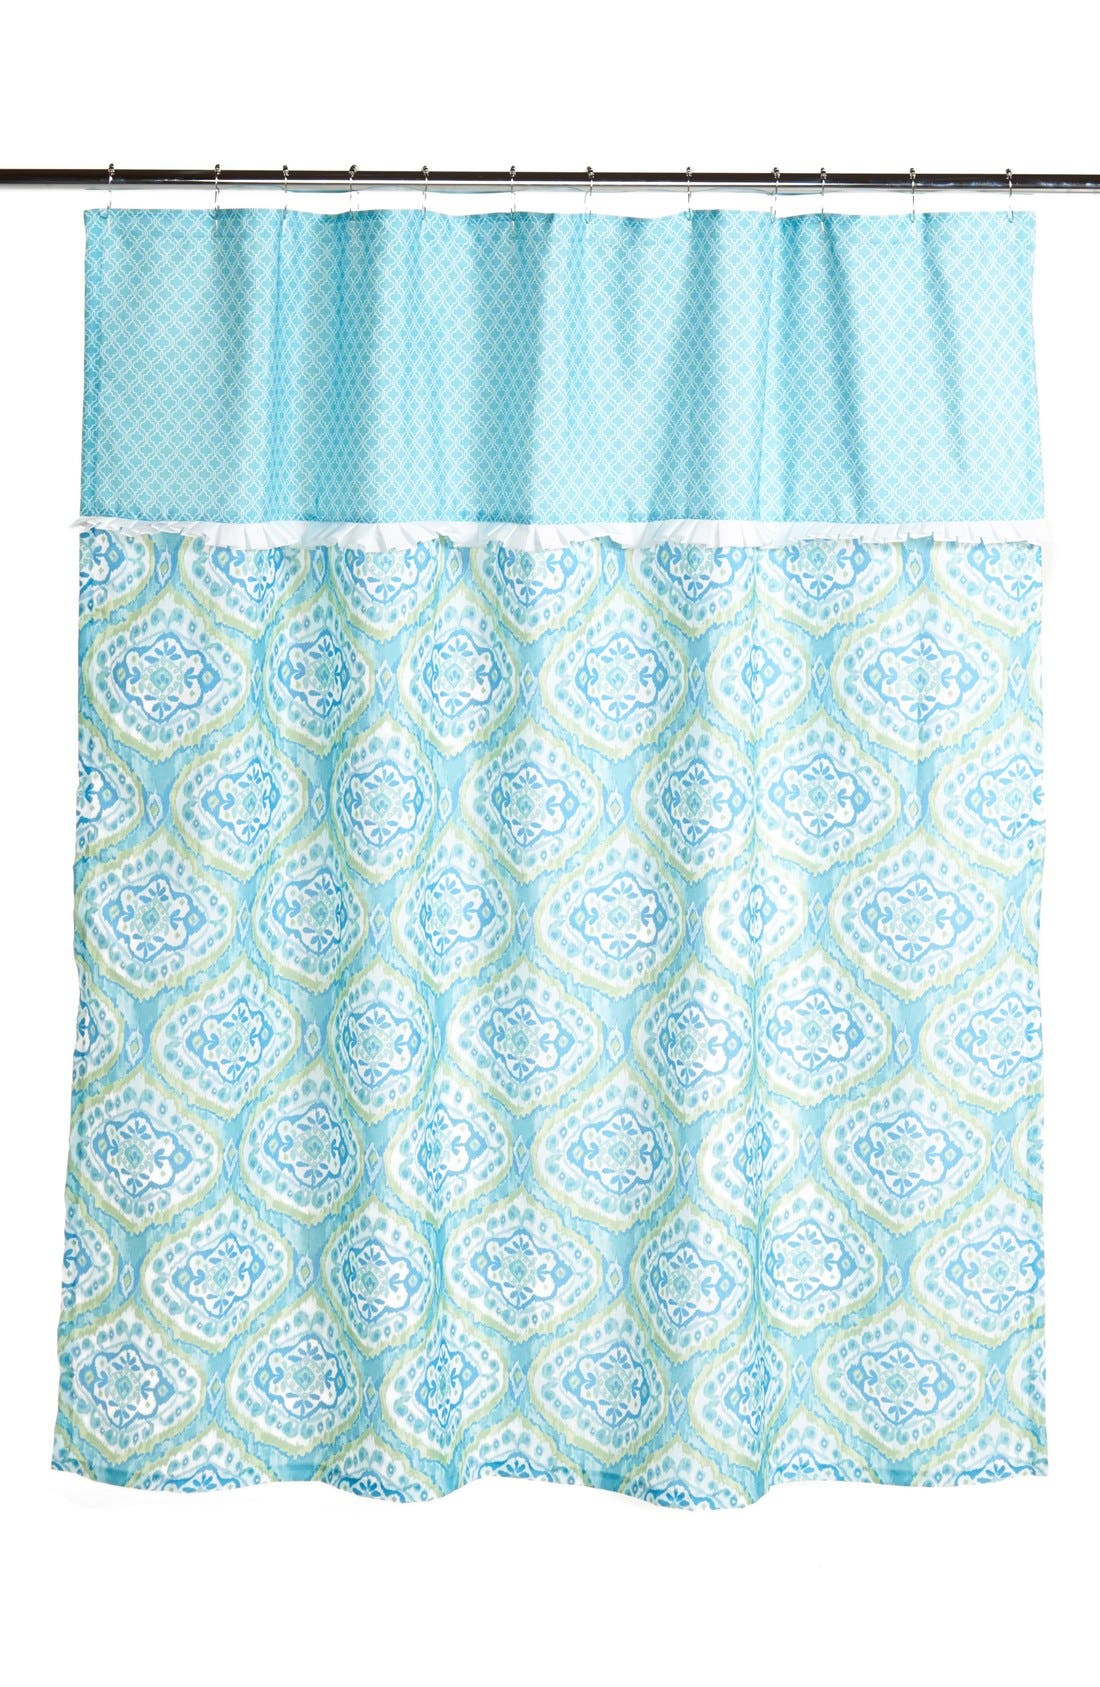 'Tangiers' Shower Curtain,                         Main,                         color, Aqua